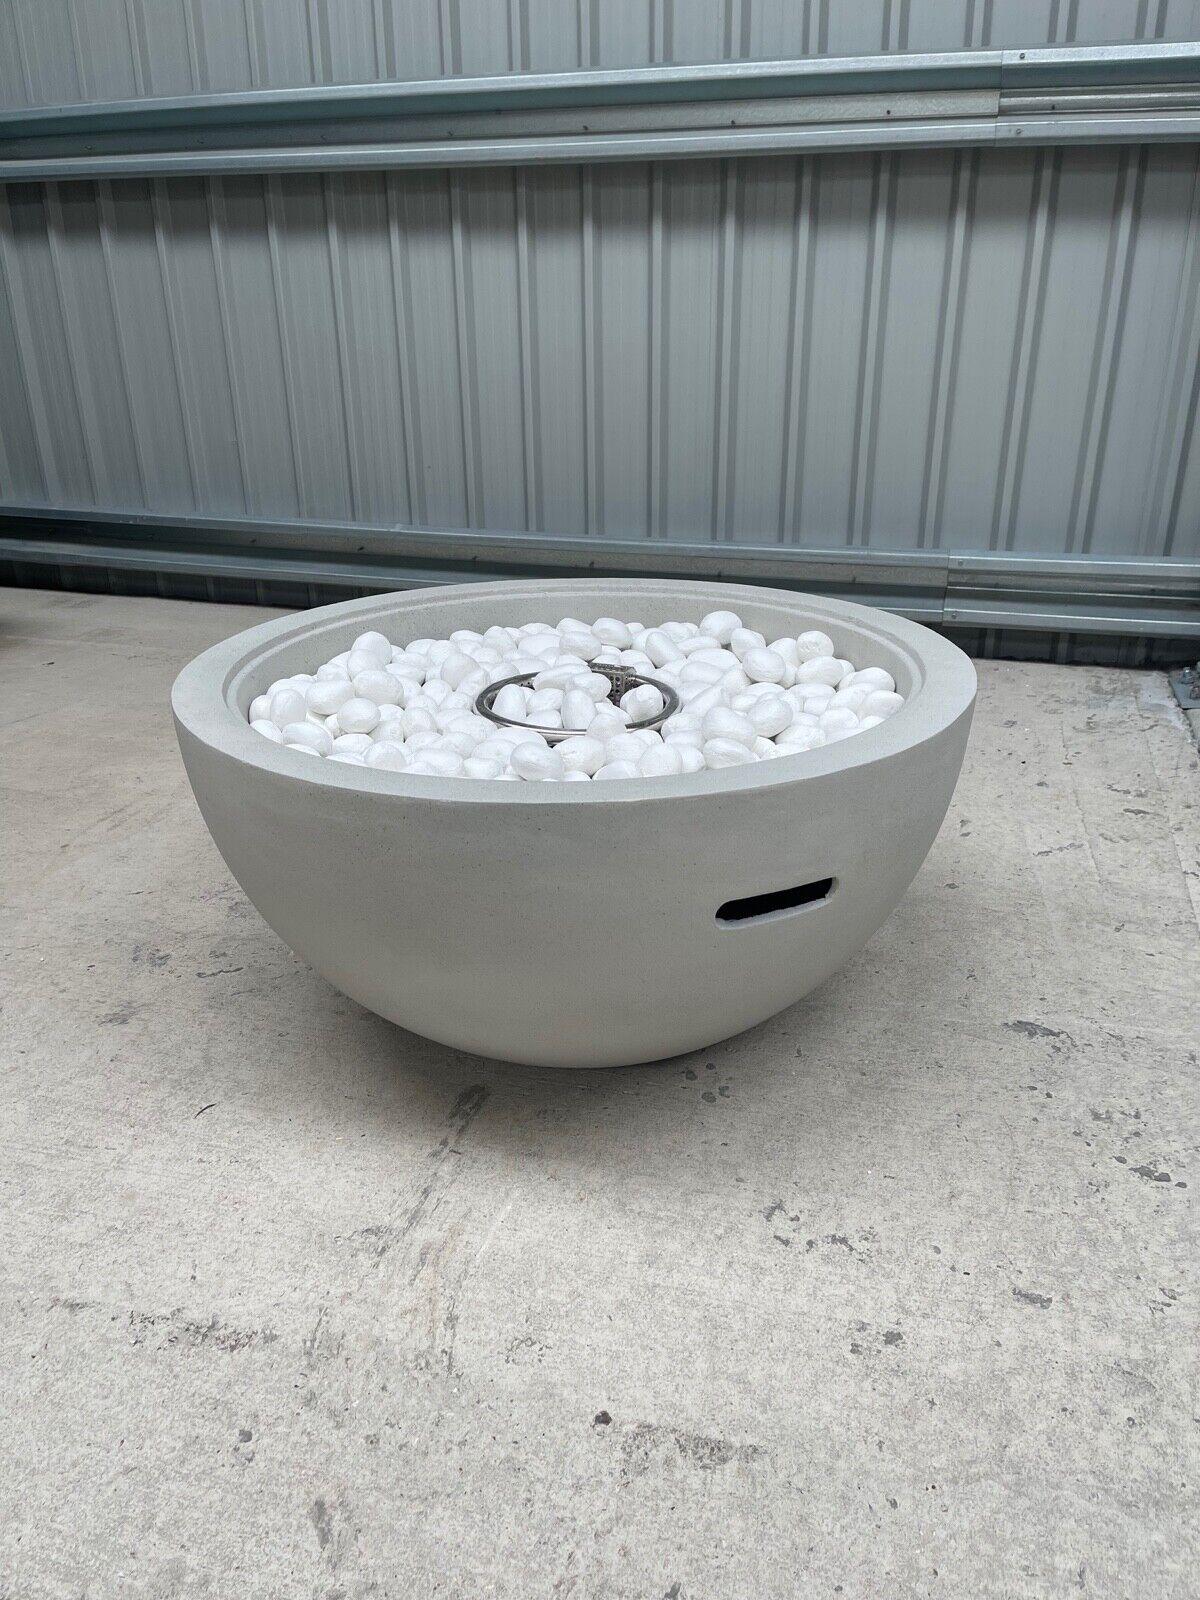 Lunar Bowl Gas Fire Pit With White Ceramic Pebbles